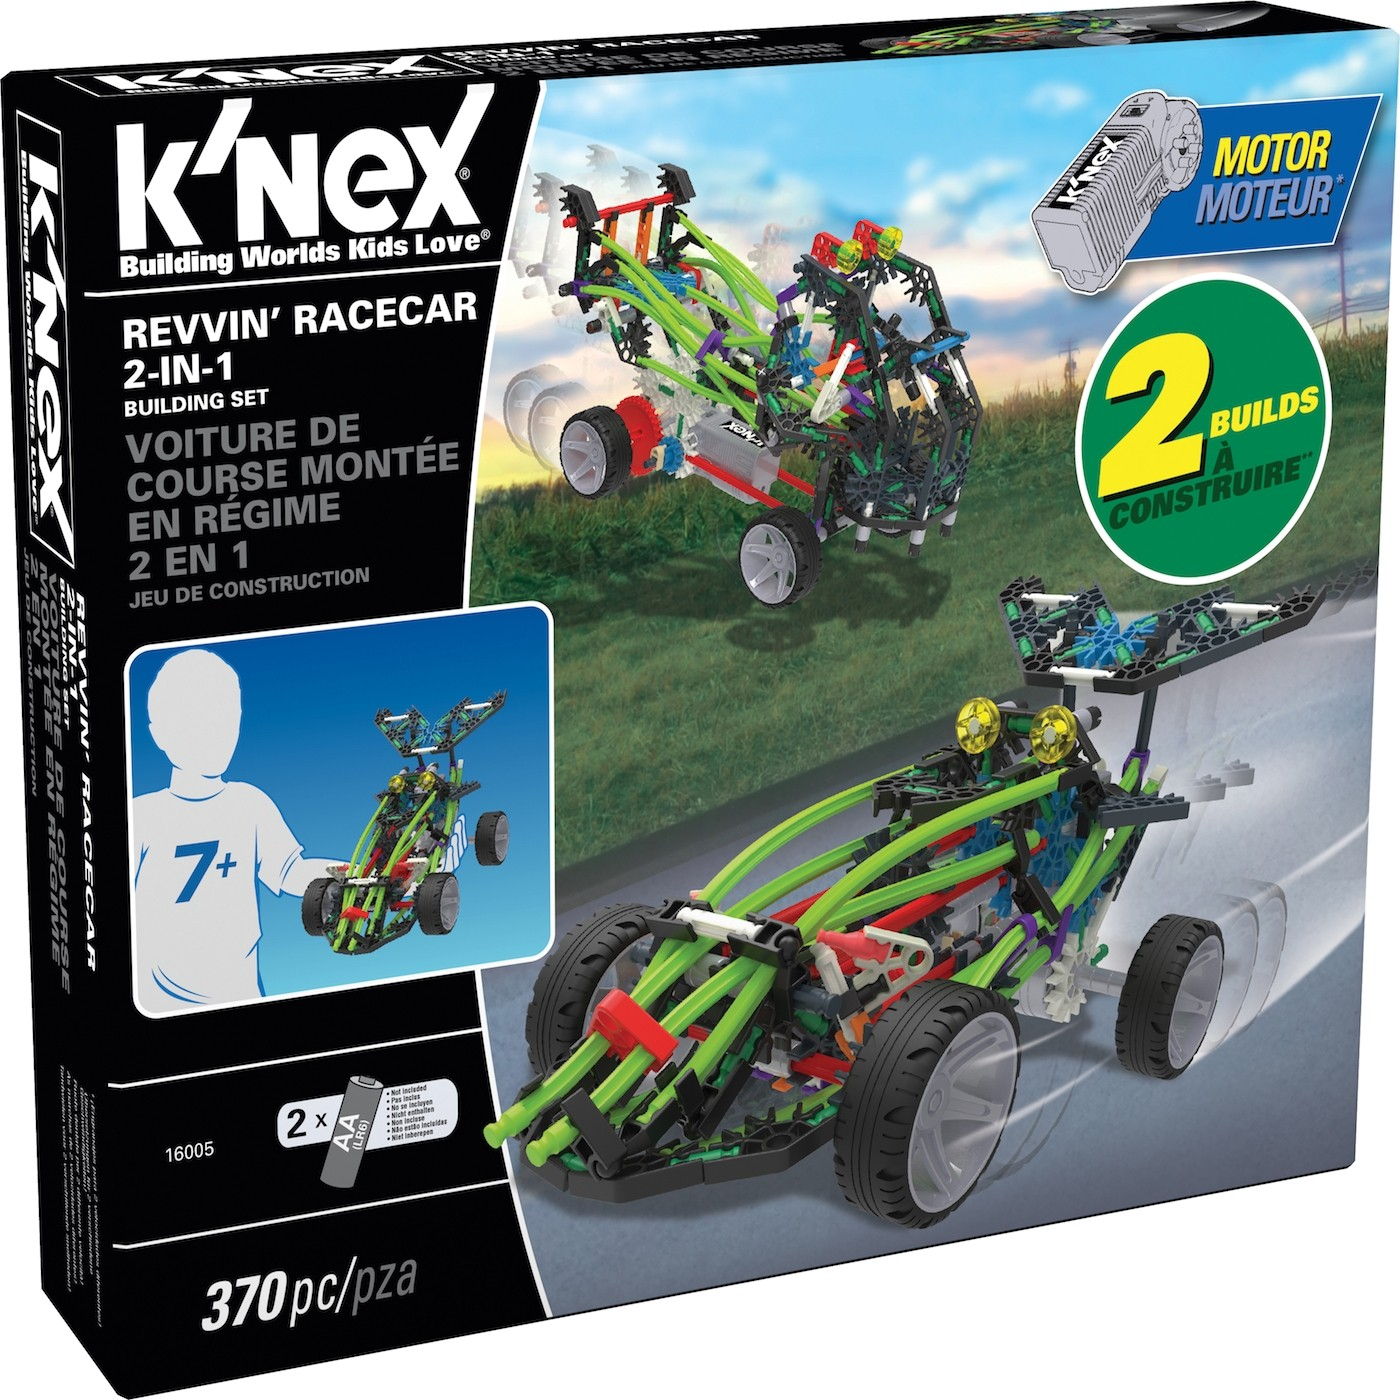 KNEX REVVIN RACER 2 IN 1 BUILDING SET